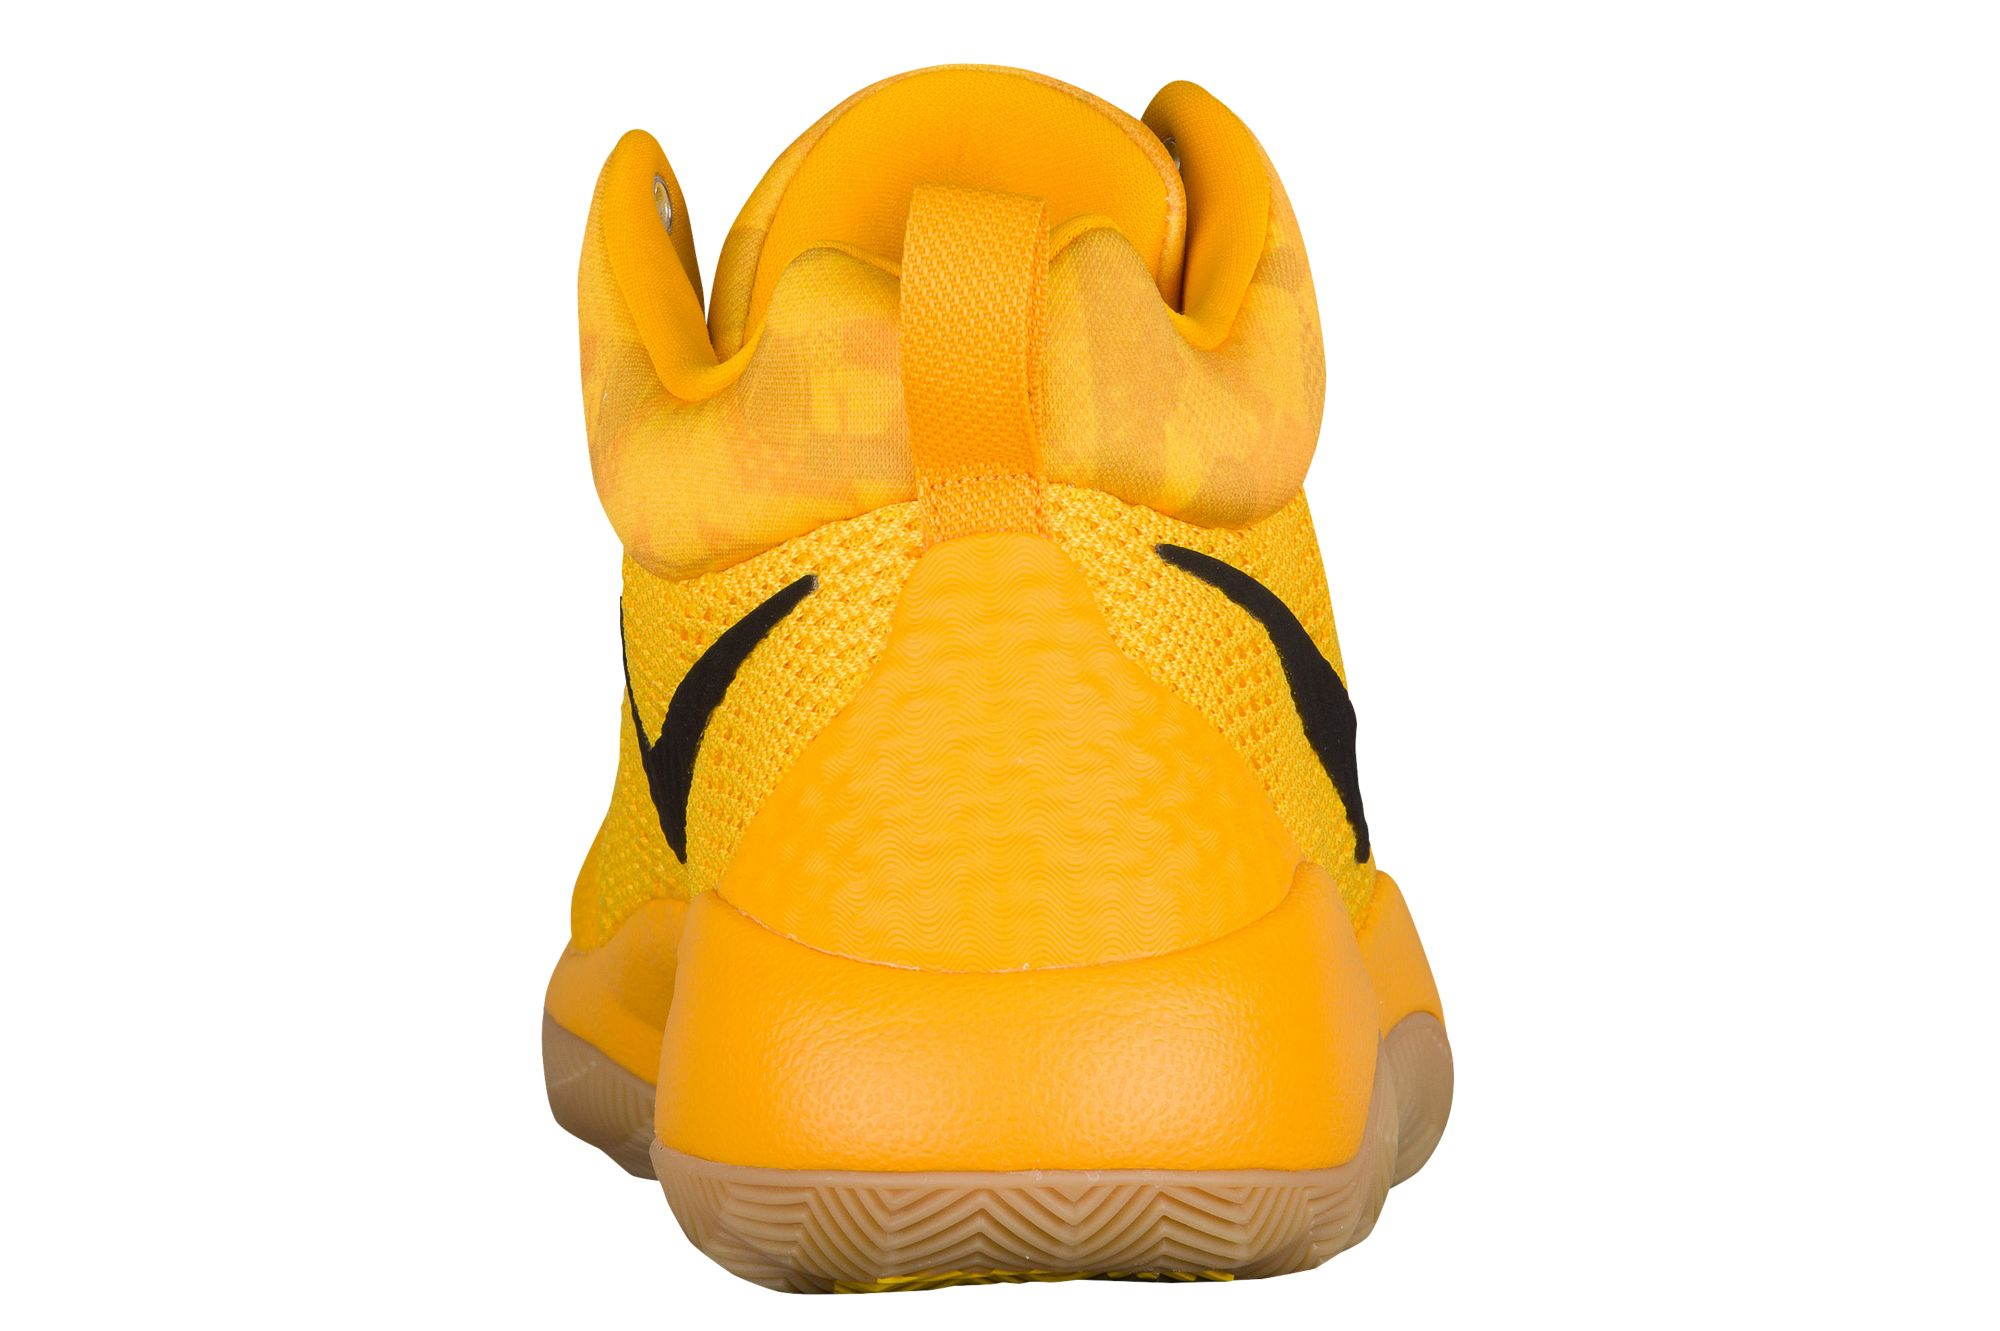 Nike Zoom rev - Tour Yellow - Heel